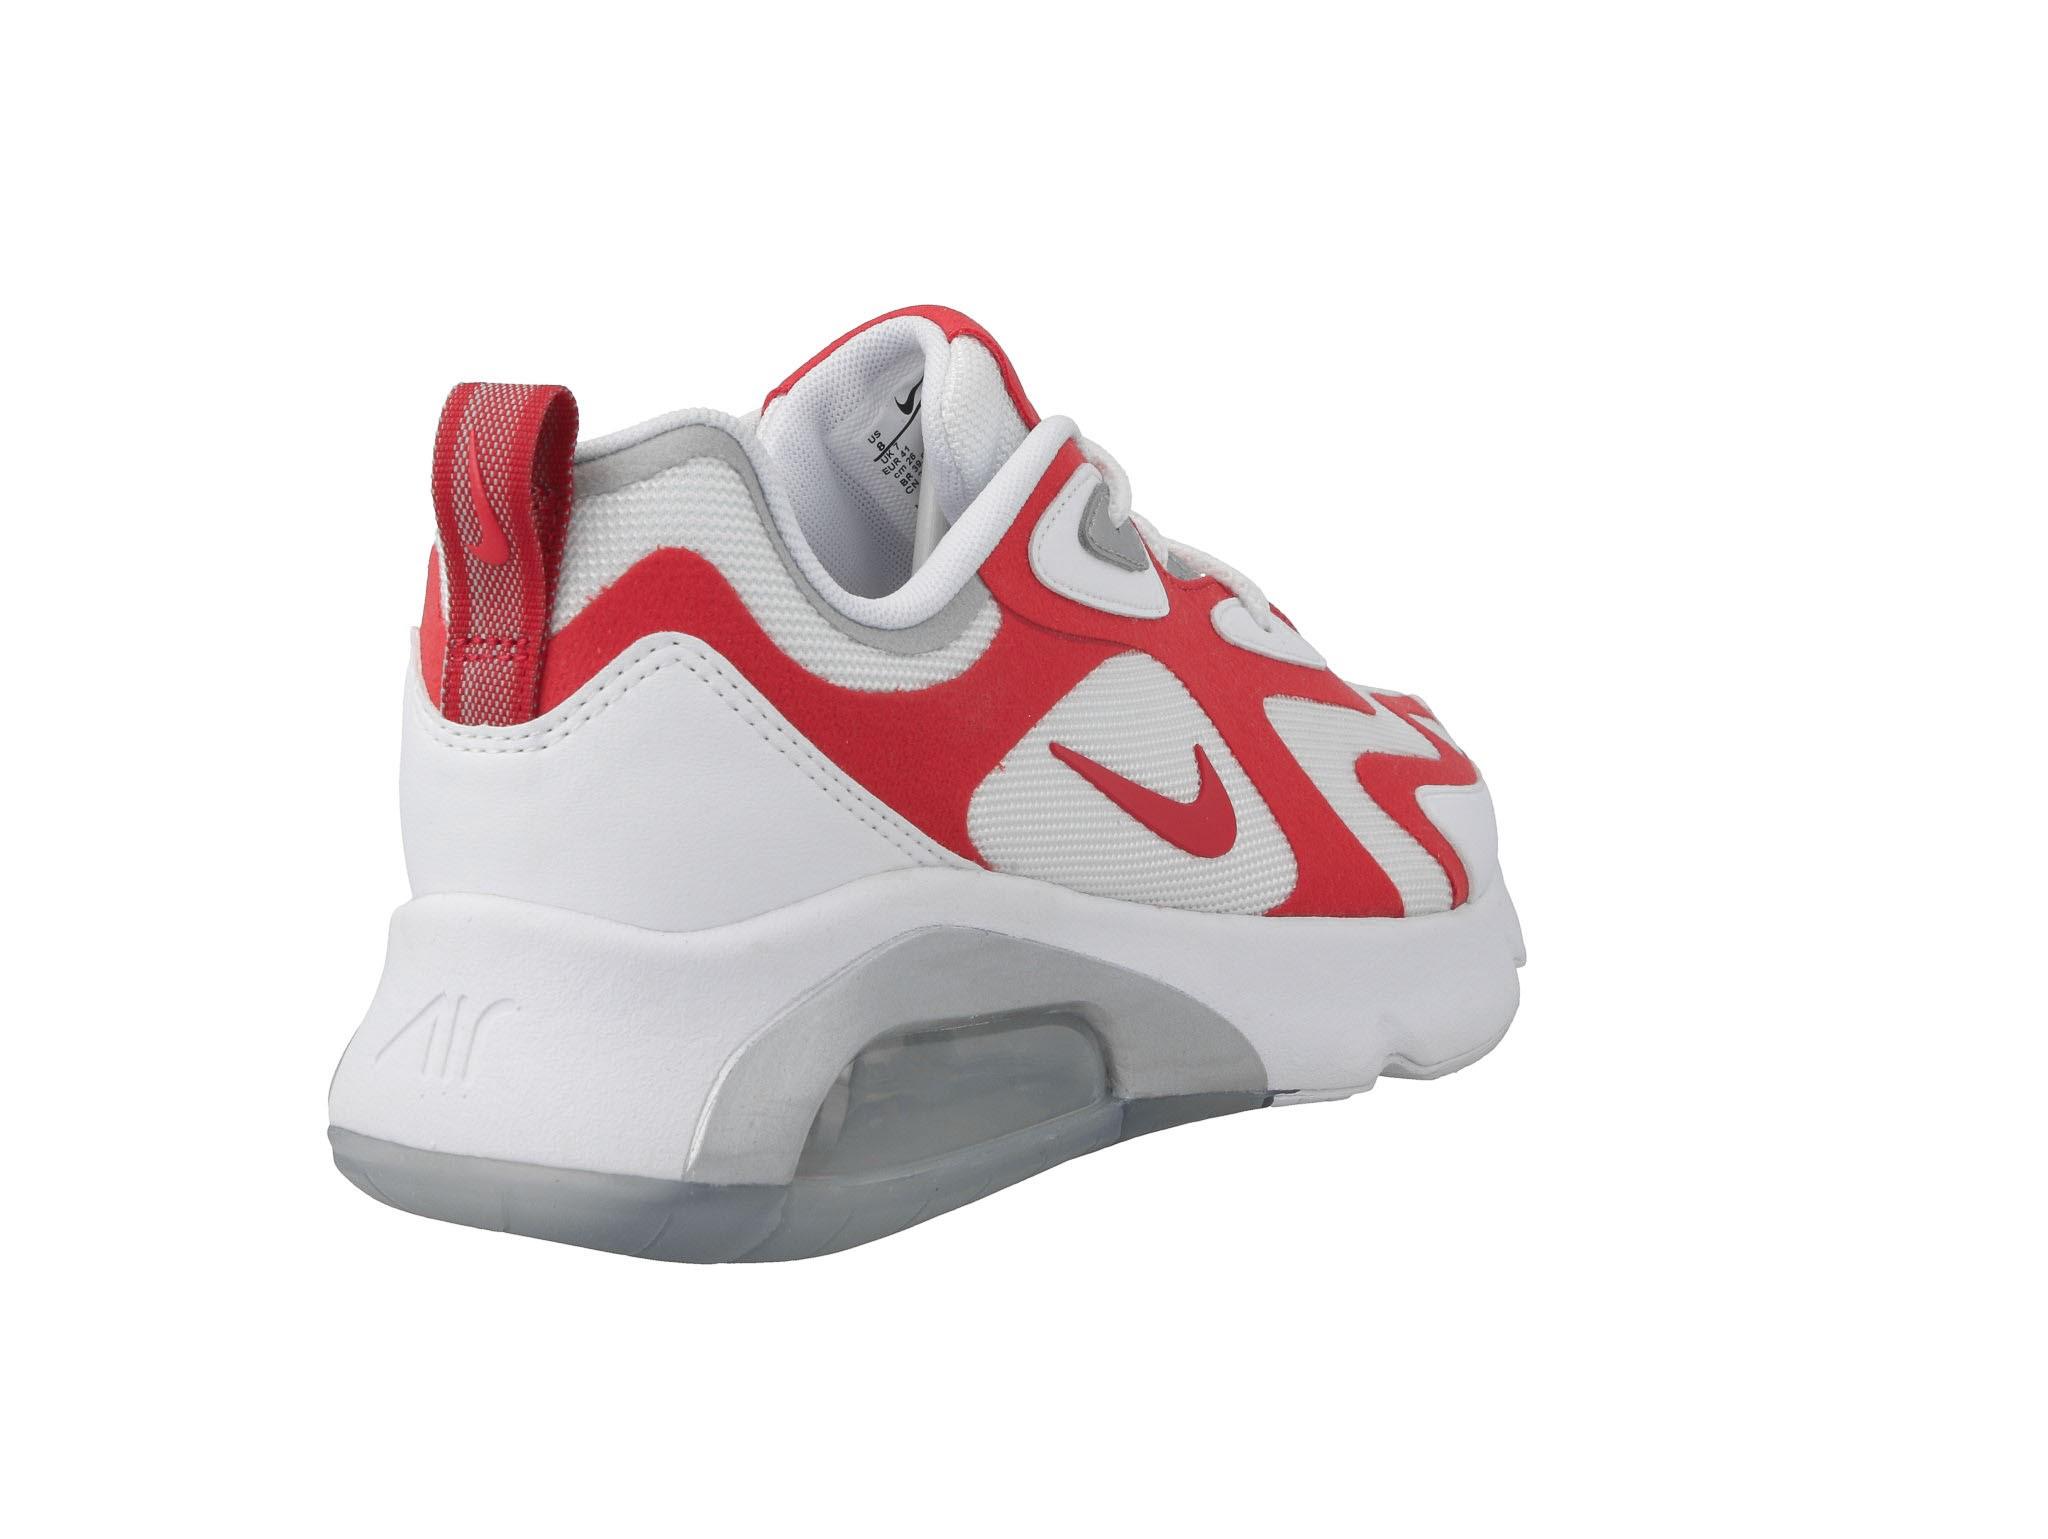 Cipő NIKE Air Max 200 AQ2568 100 WhiteUniversity Red